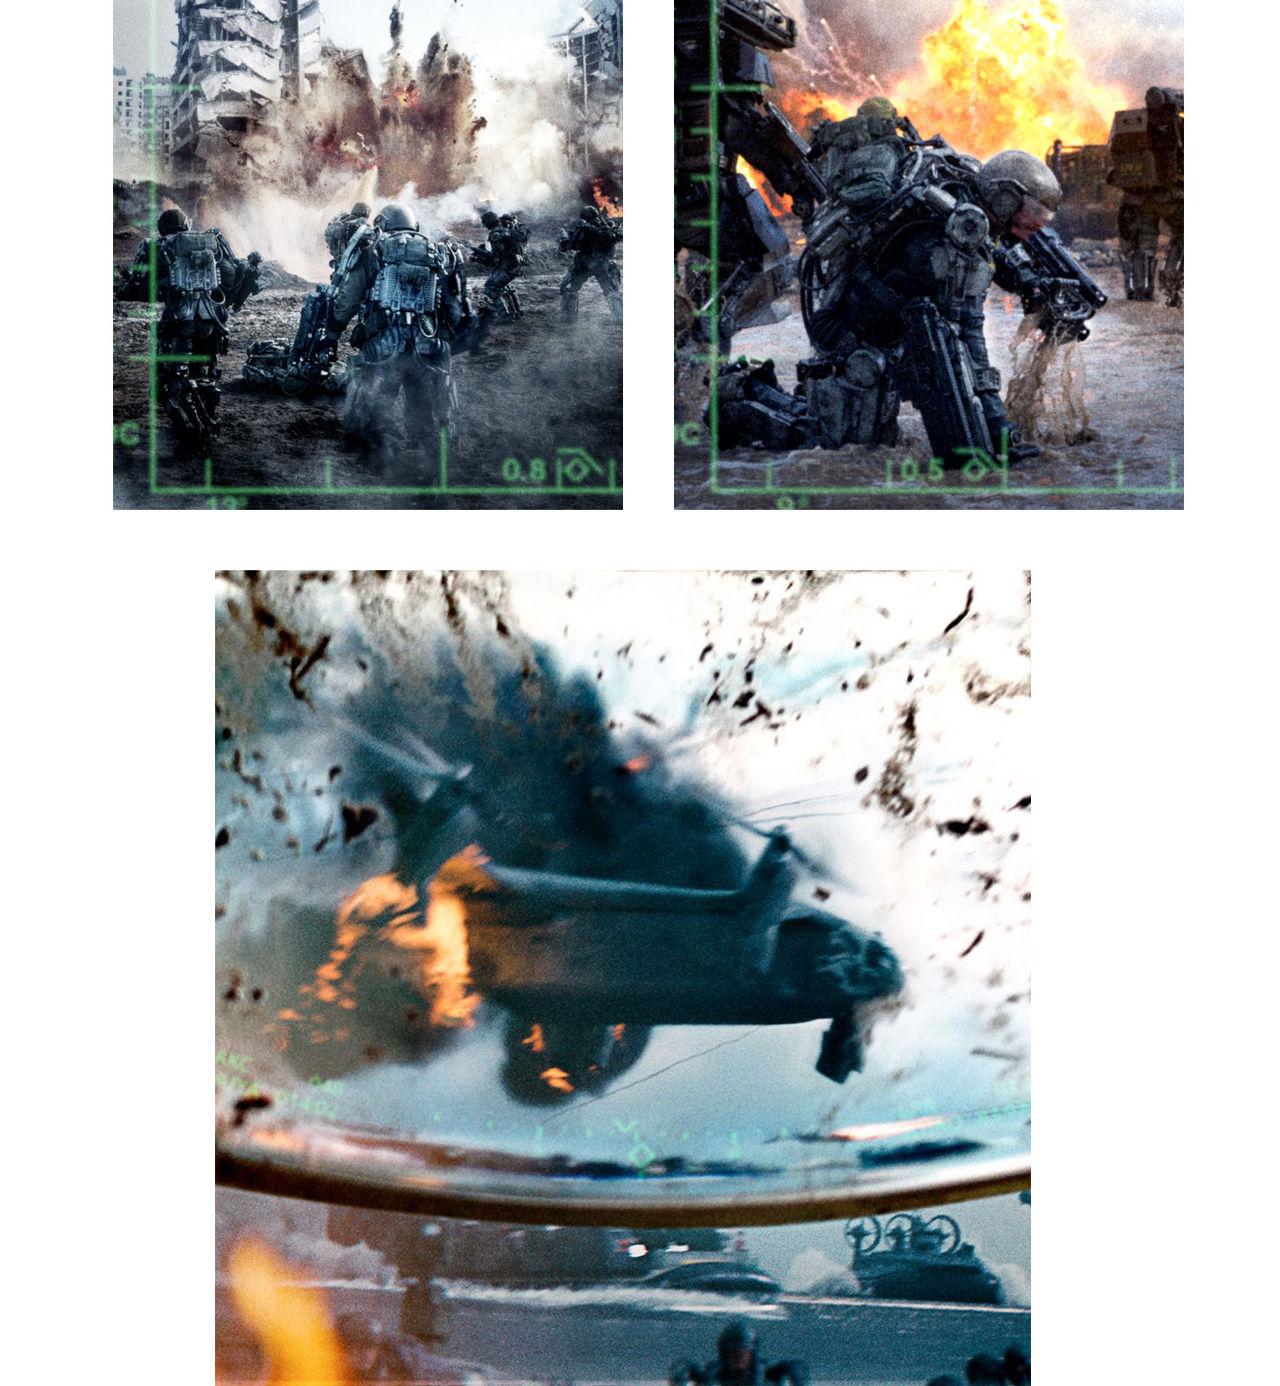 Bilder från Tom Cruises nya sci-fi